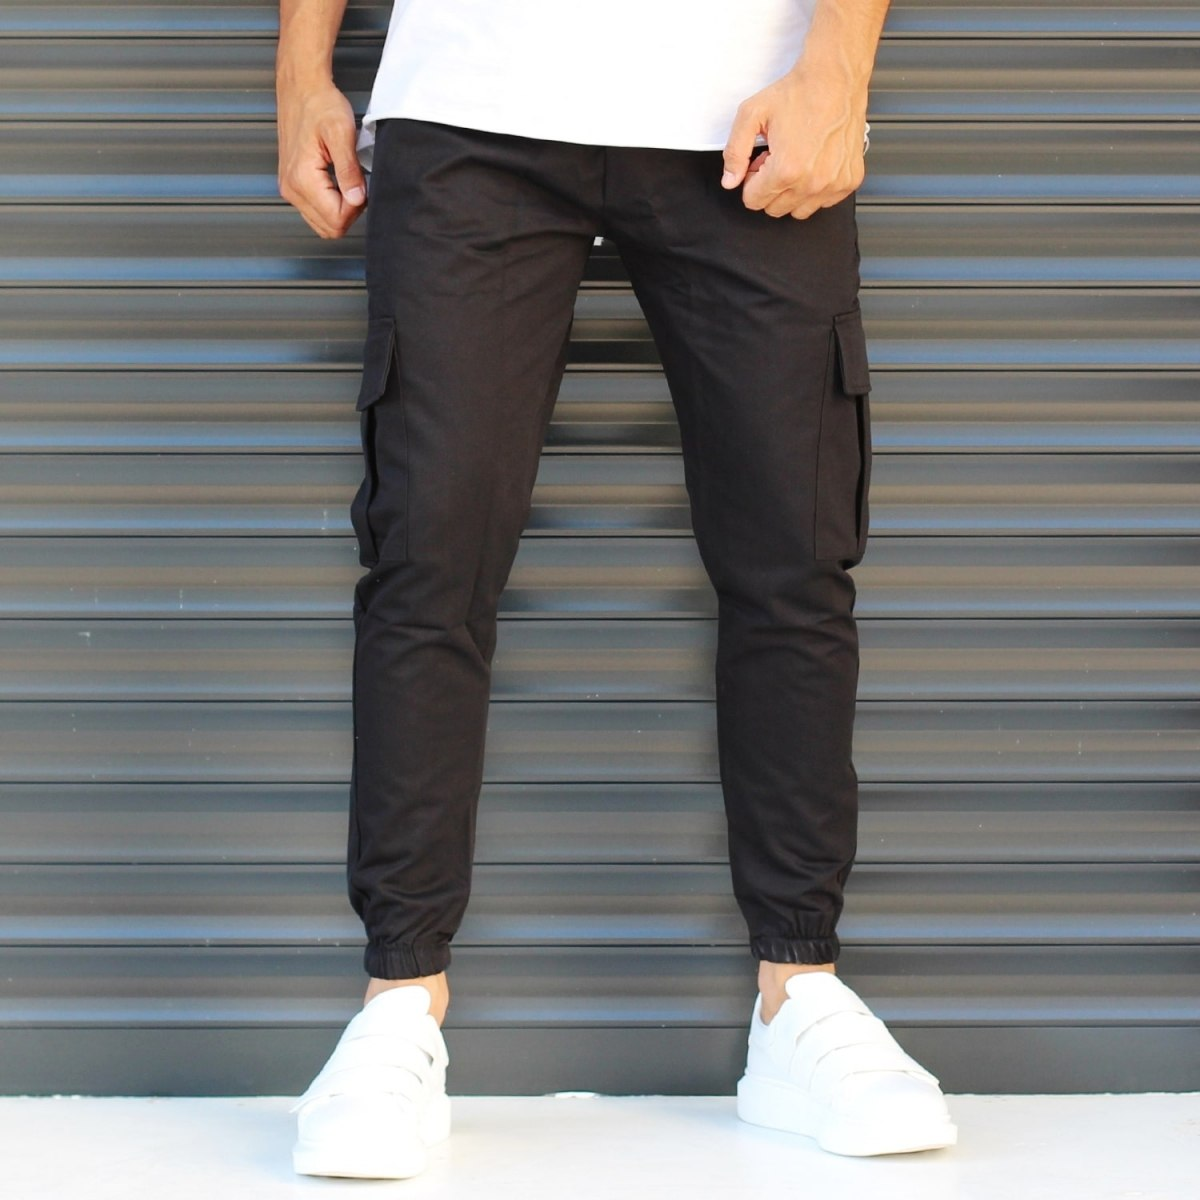 Men's Sport Pants With Side Pockets Black Mv Premium Brand - 1